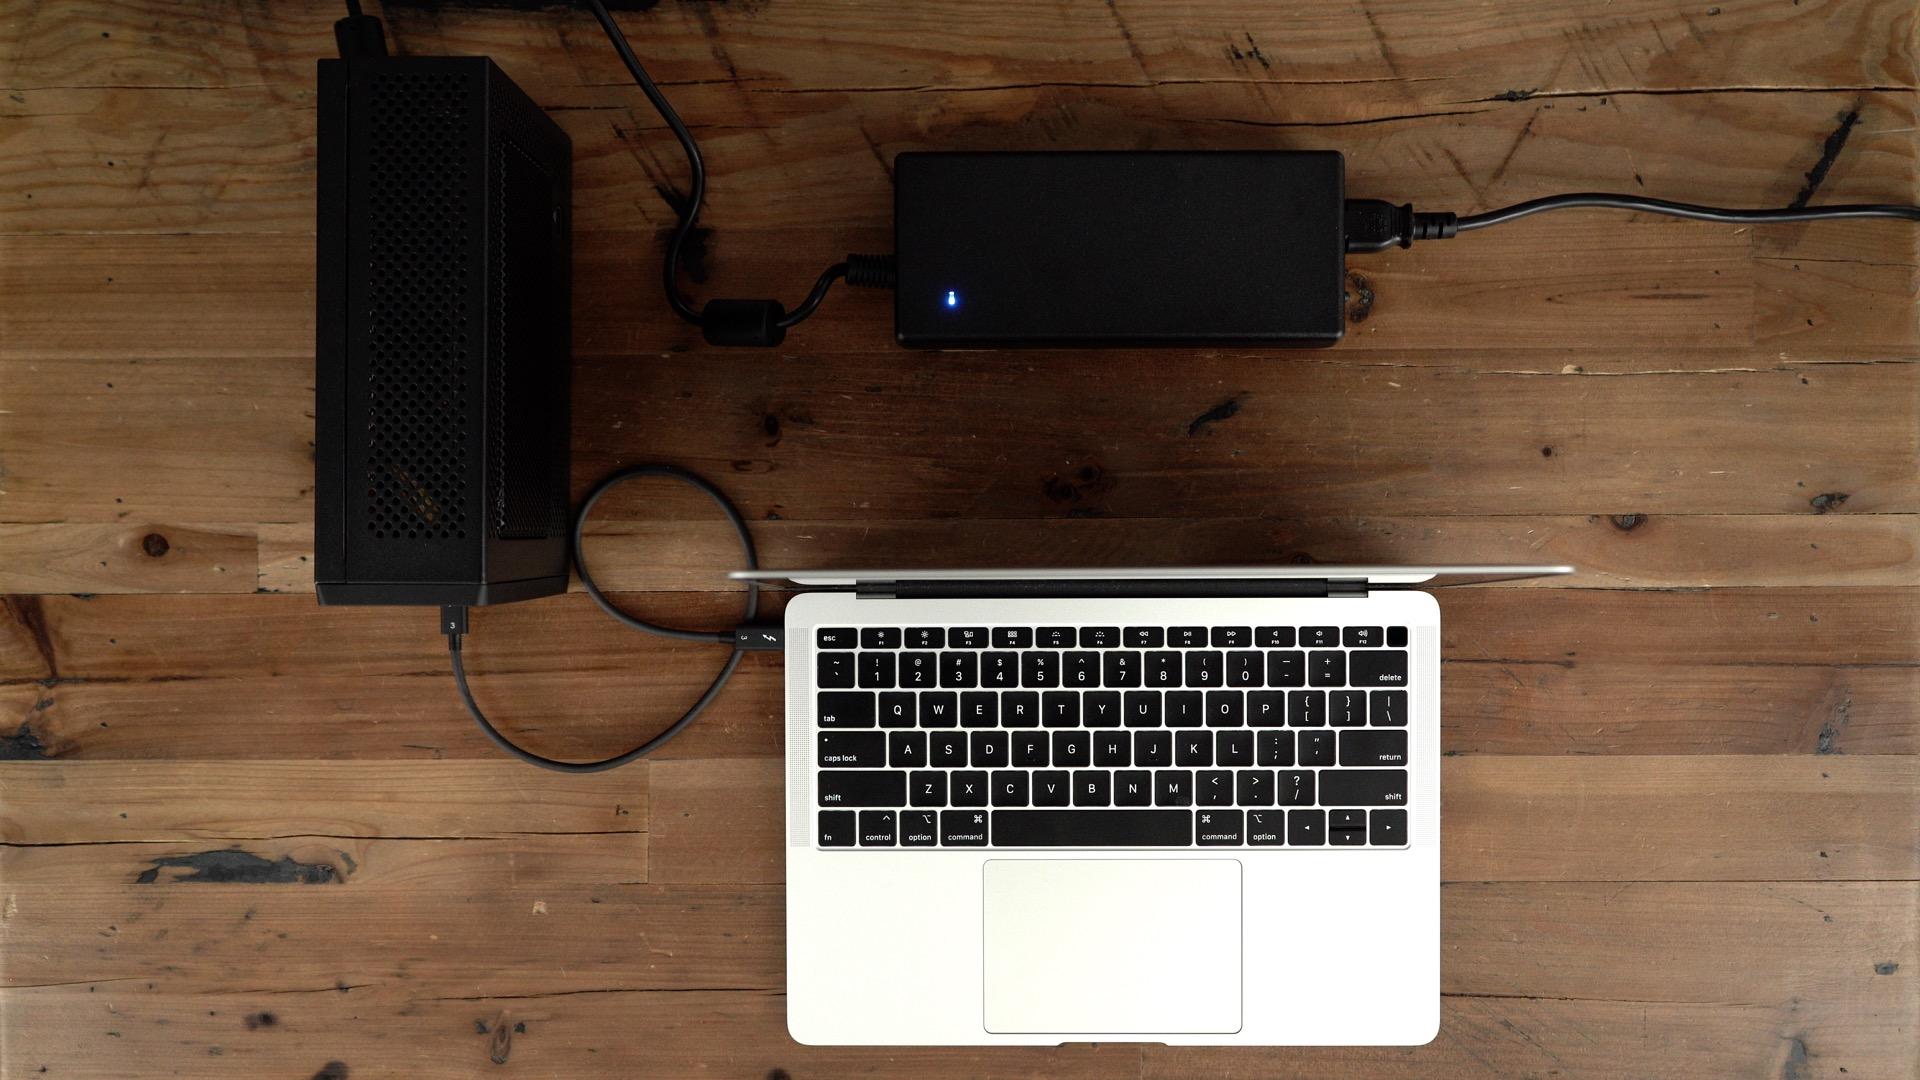 PowerColor Mini Pro eGPU RX 570 MacBook Air Setup